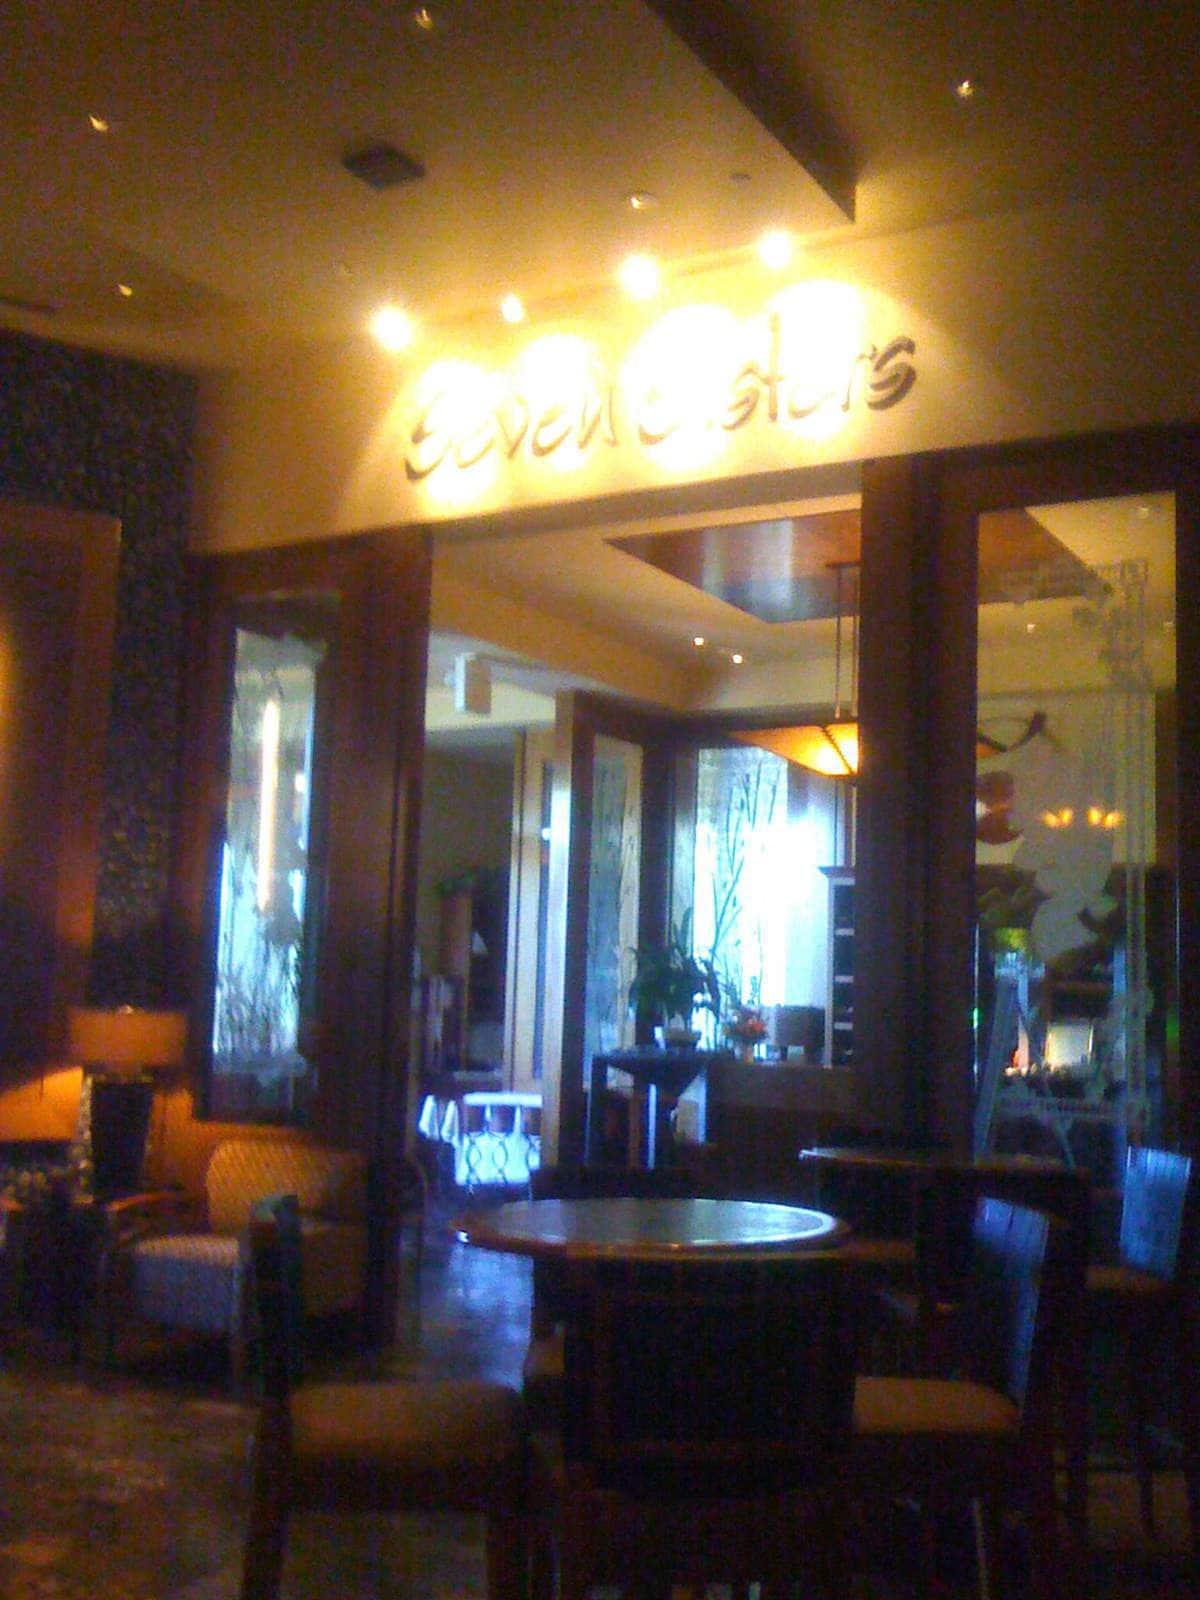 Seven sisters restaurant black oak casino casino online payout poker video